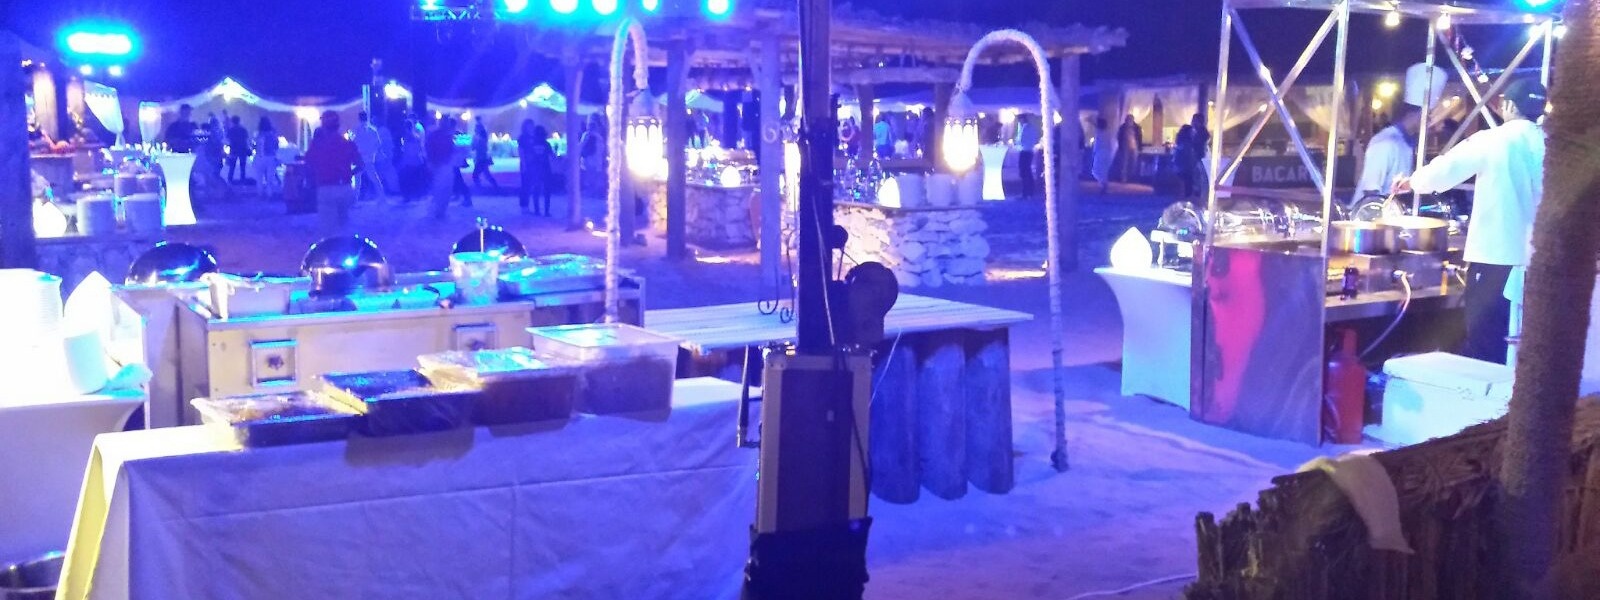 bedrijfsuitje-beach-bbq-event-eindhoven